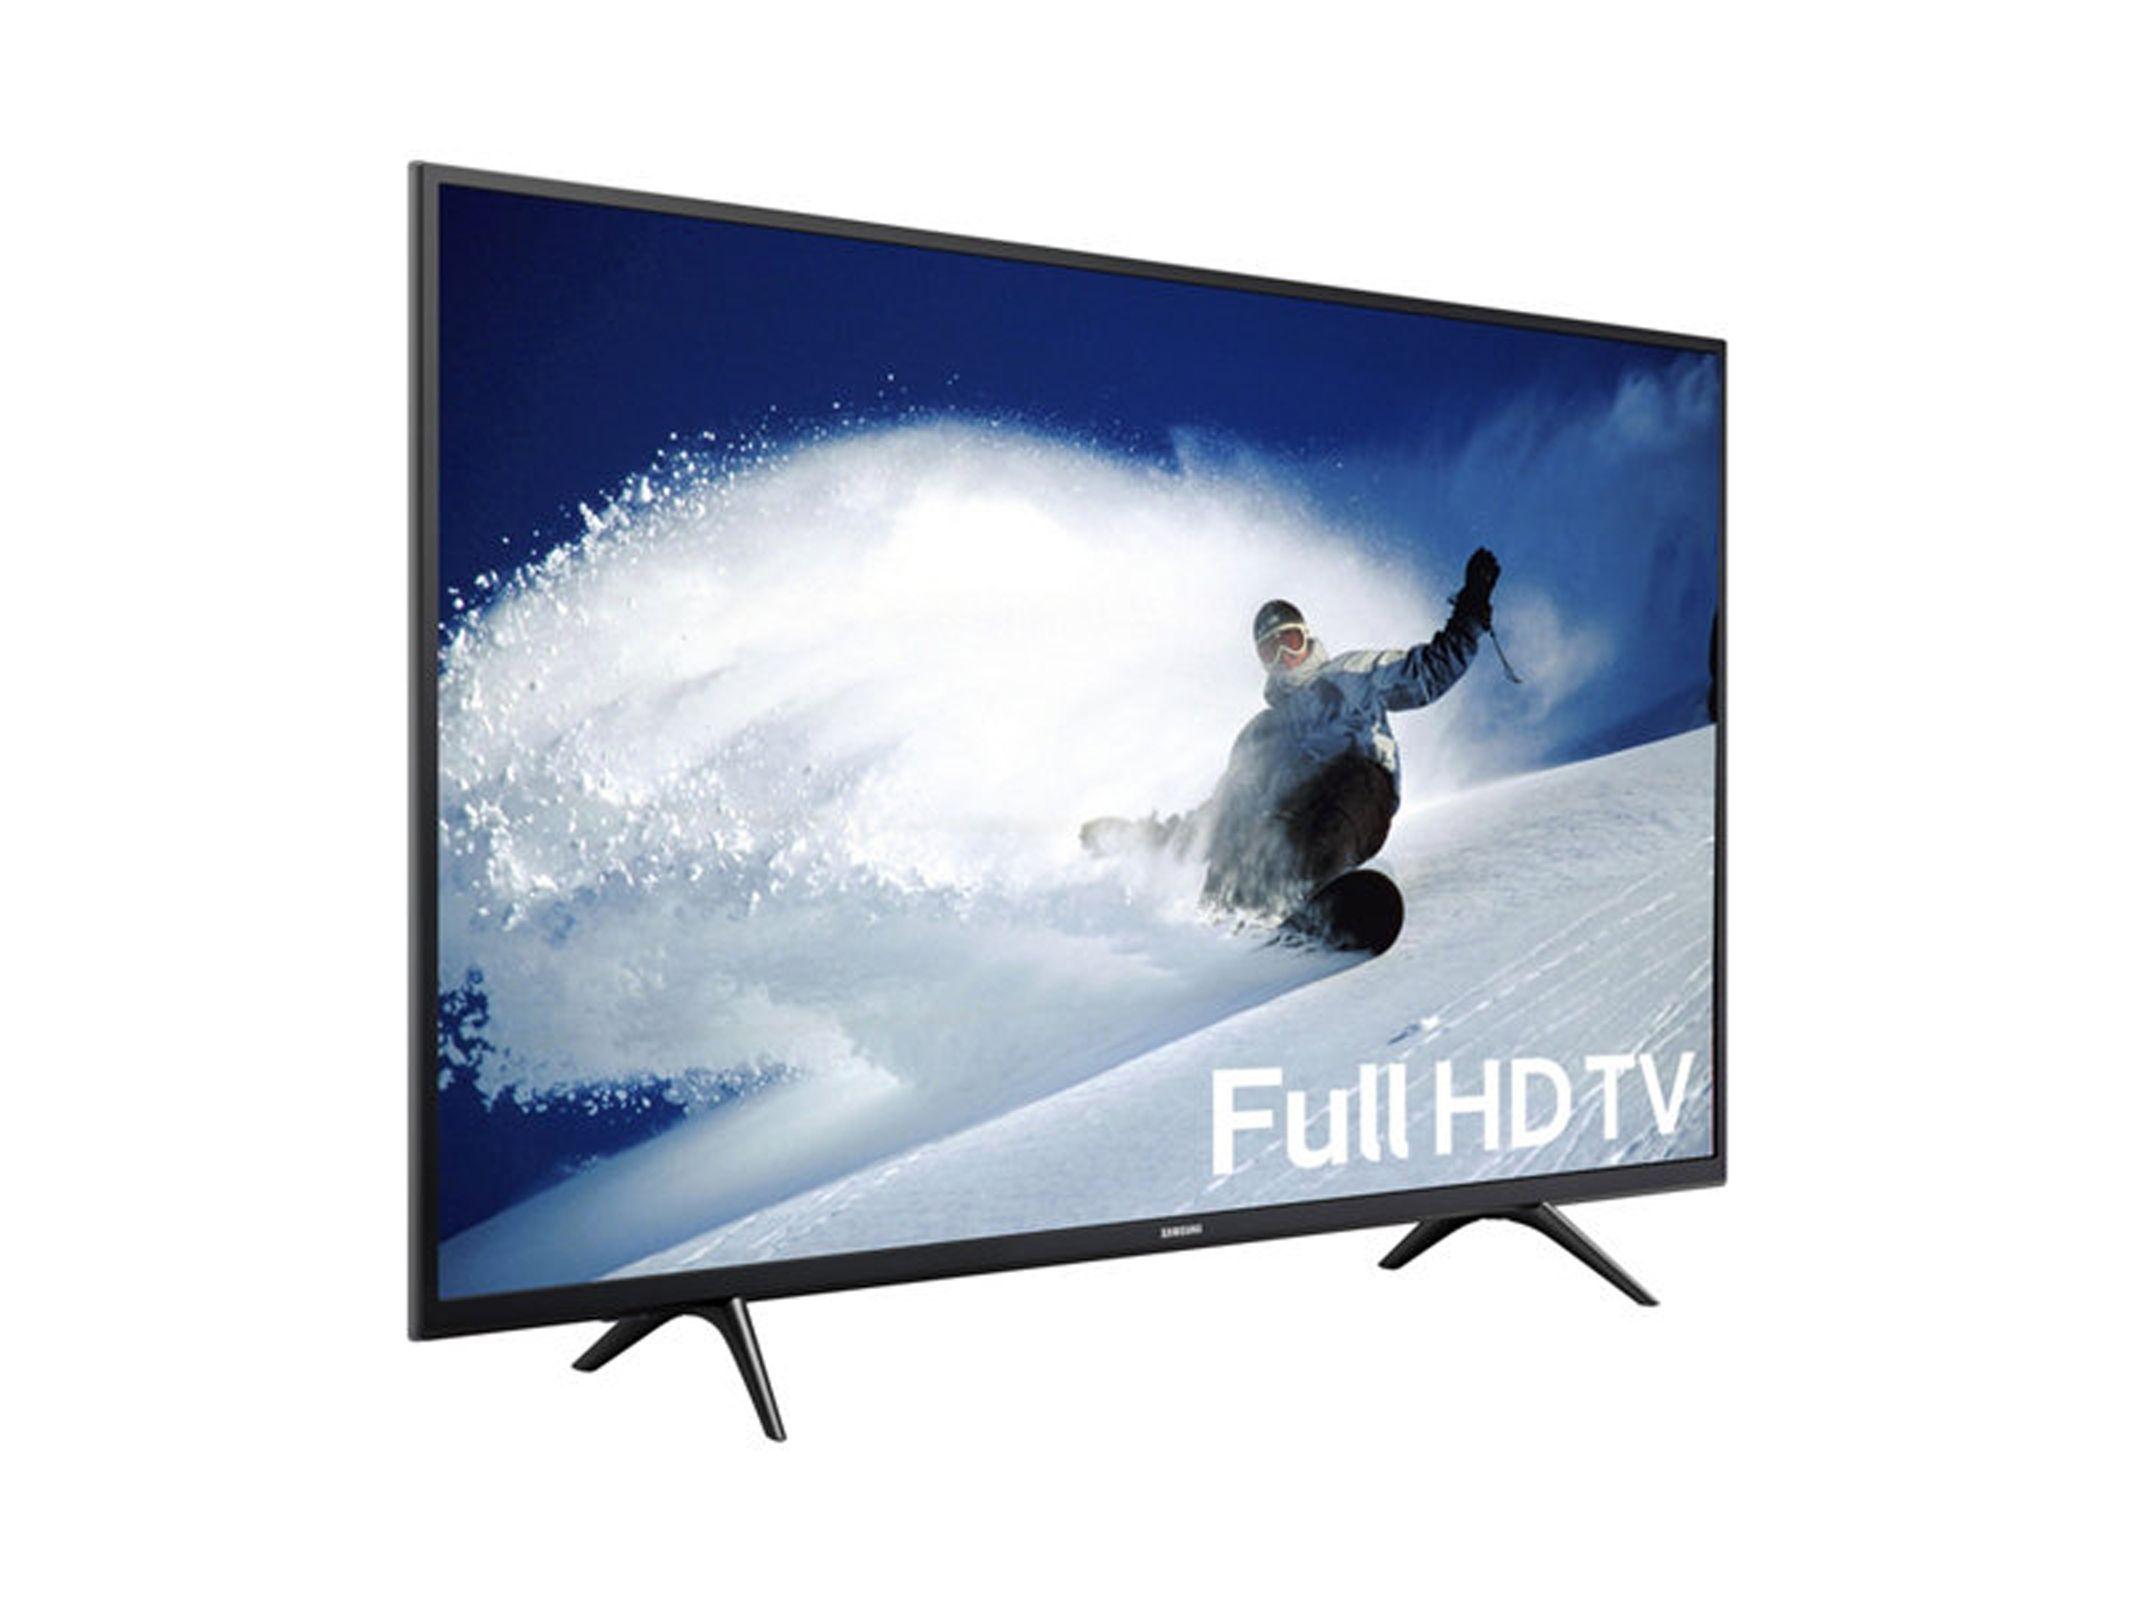 Samsung Un43j5202afxza 43 Class J5202 Full Hd 1080p Led Tv Sears Outlet Smart Tv Led Tv Samsung Samsung 43 smart 1080p led lcd tv